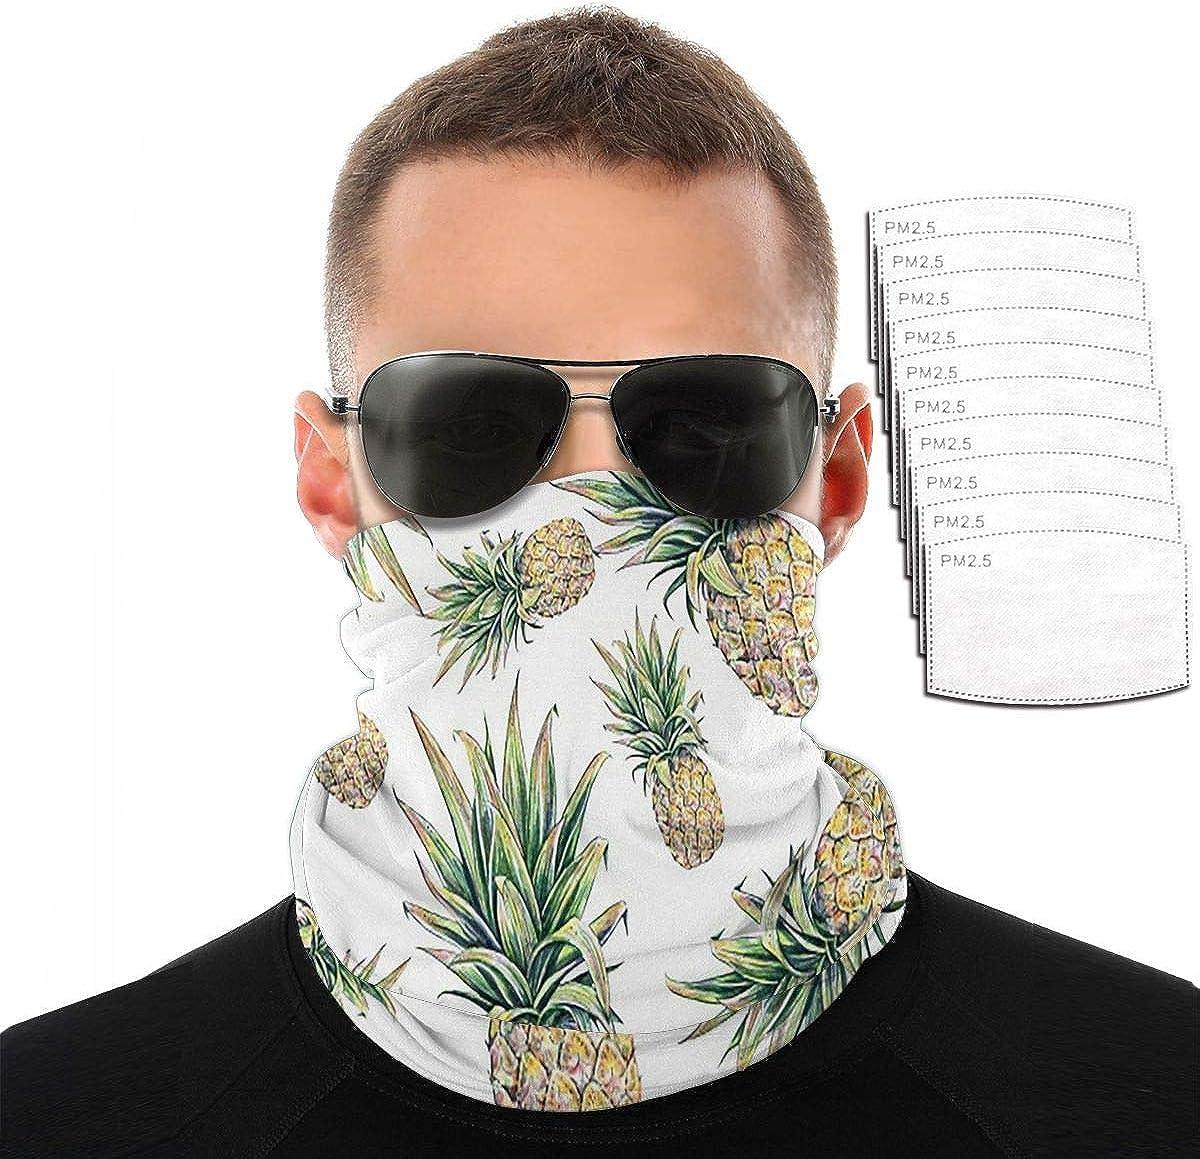 KiuLoam Bandana Face Mask Reusable,Stylish Tropical Pineapple Fruits Neck Gaiter Balaclava for Women Men